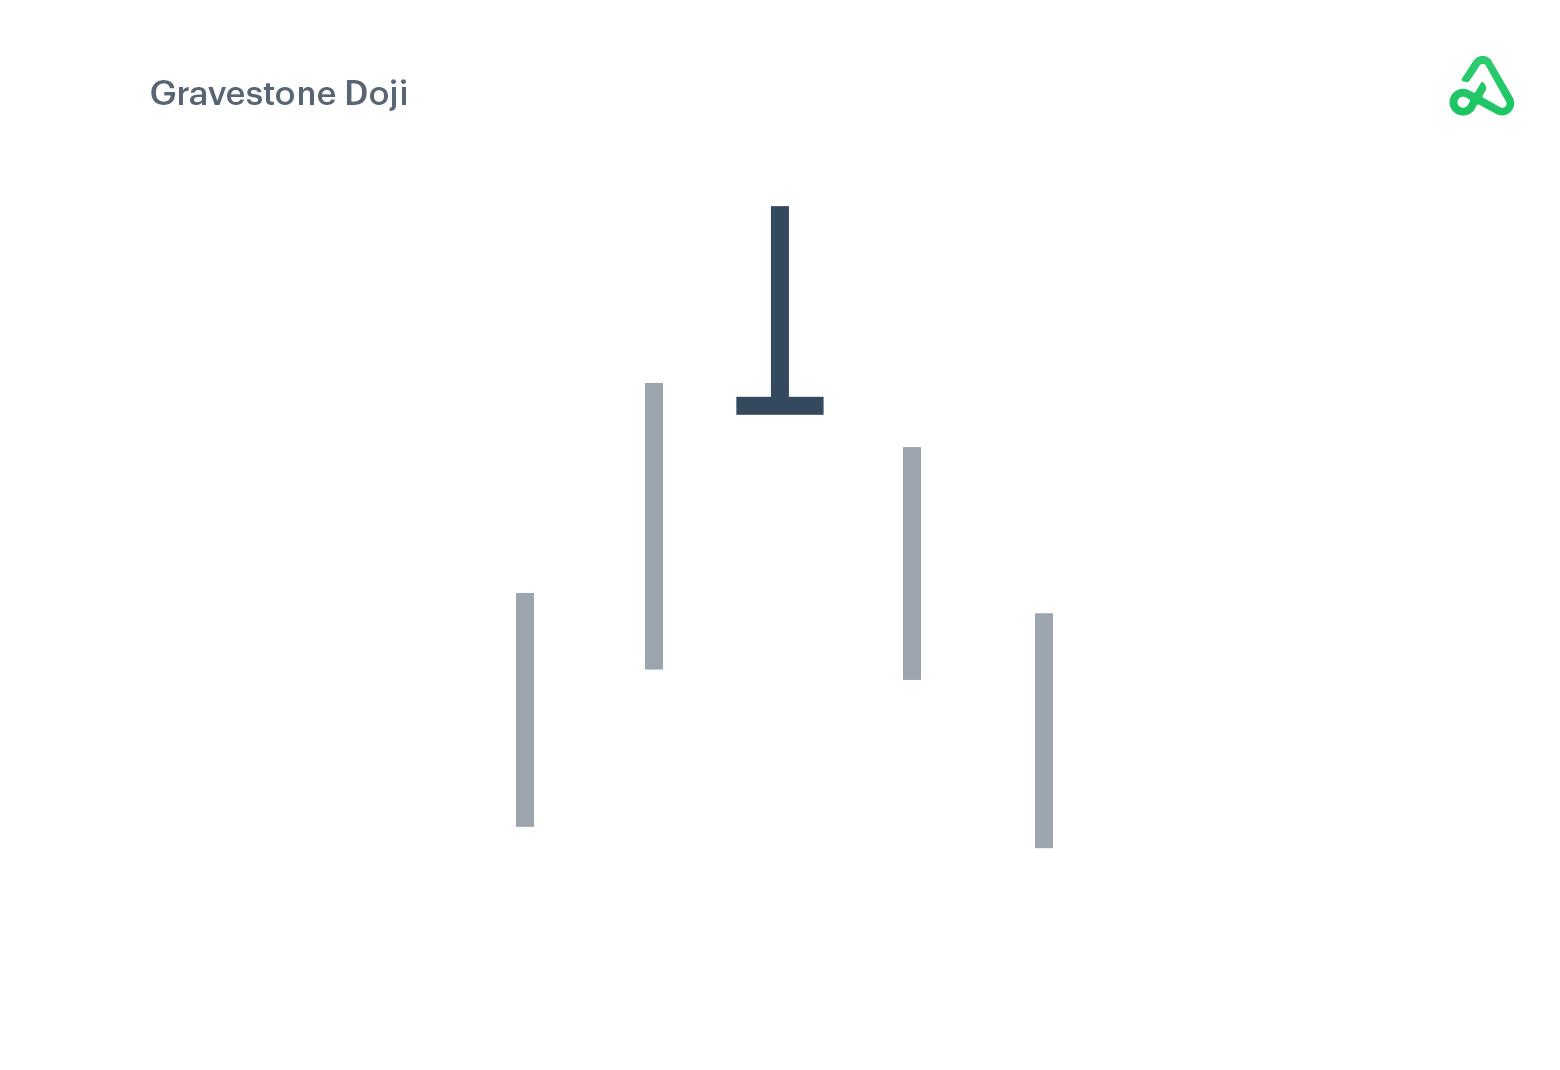 Gravestone Doji example image